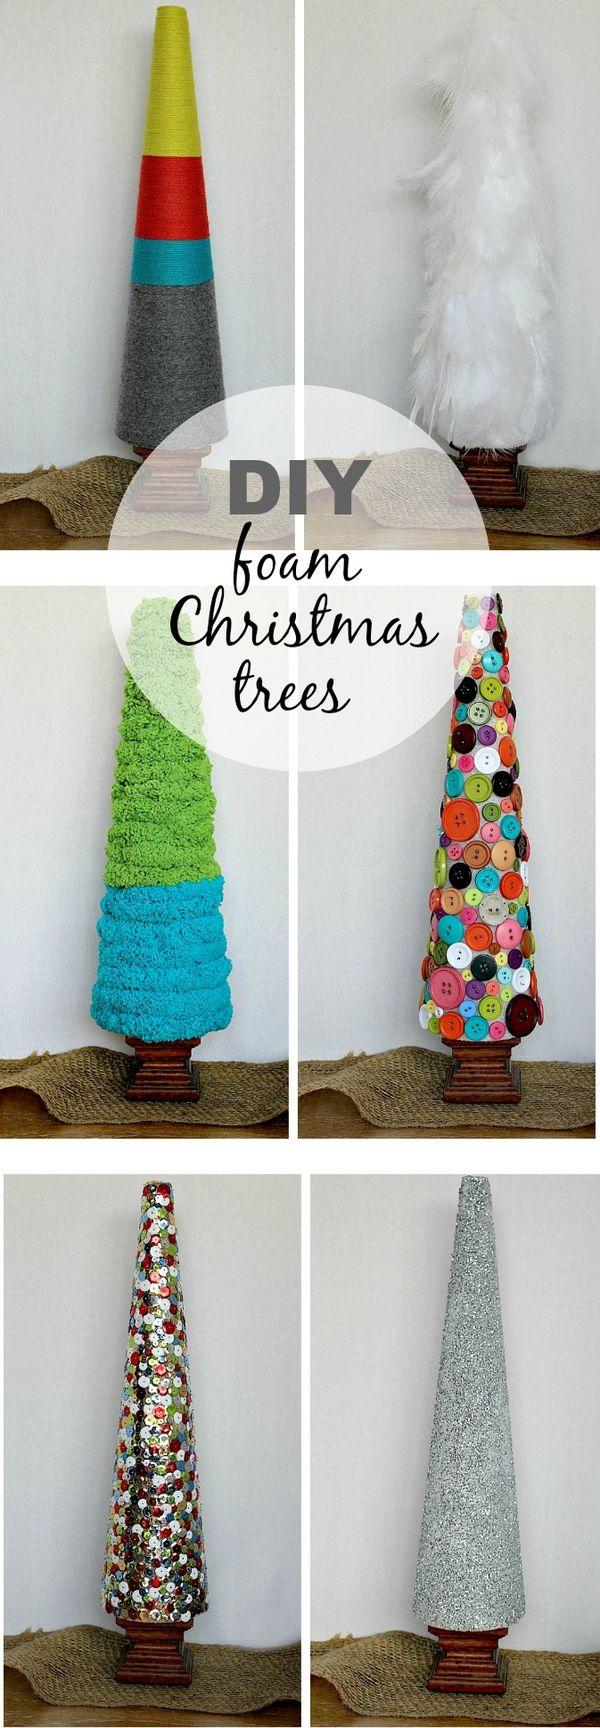 DIY foam Christmas trees